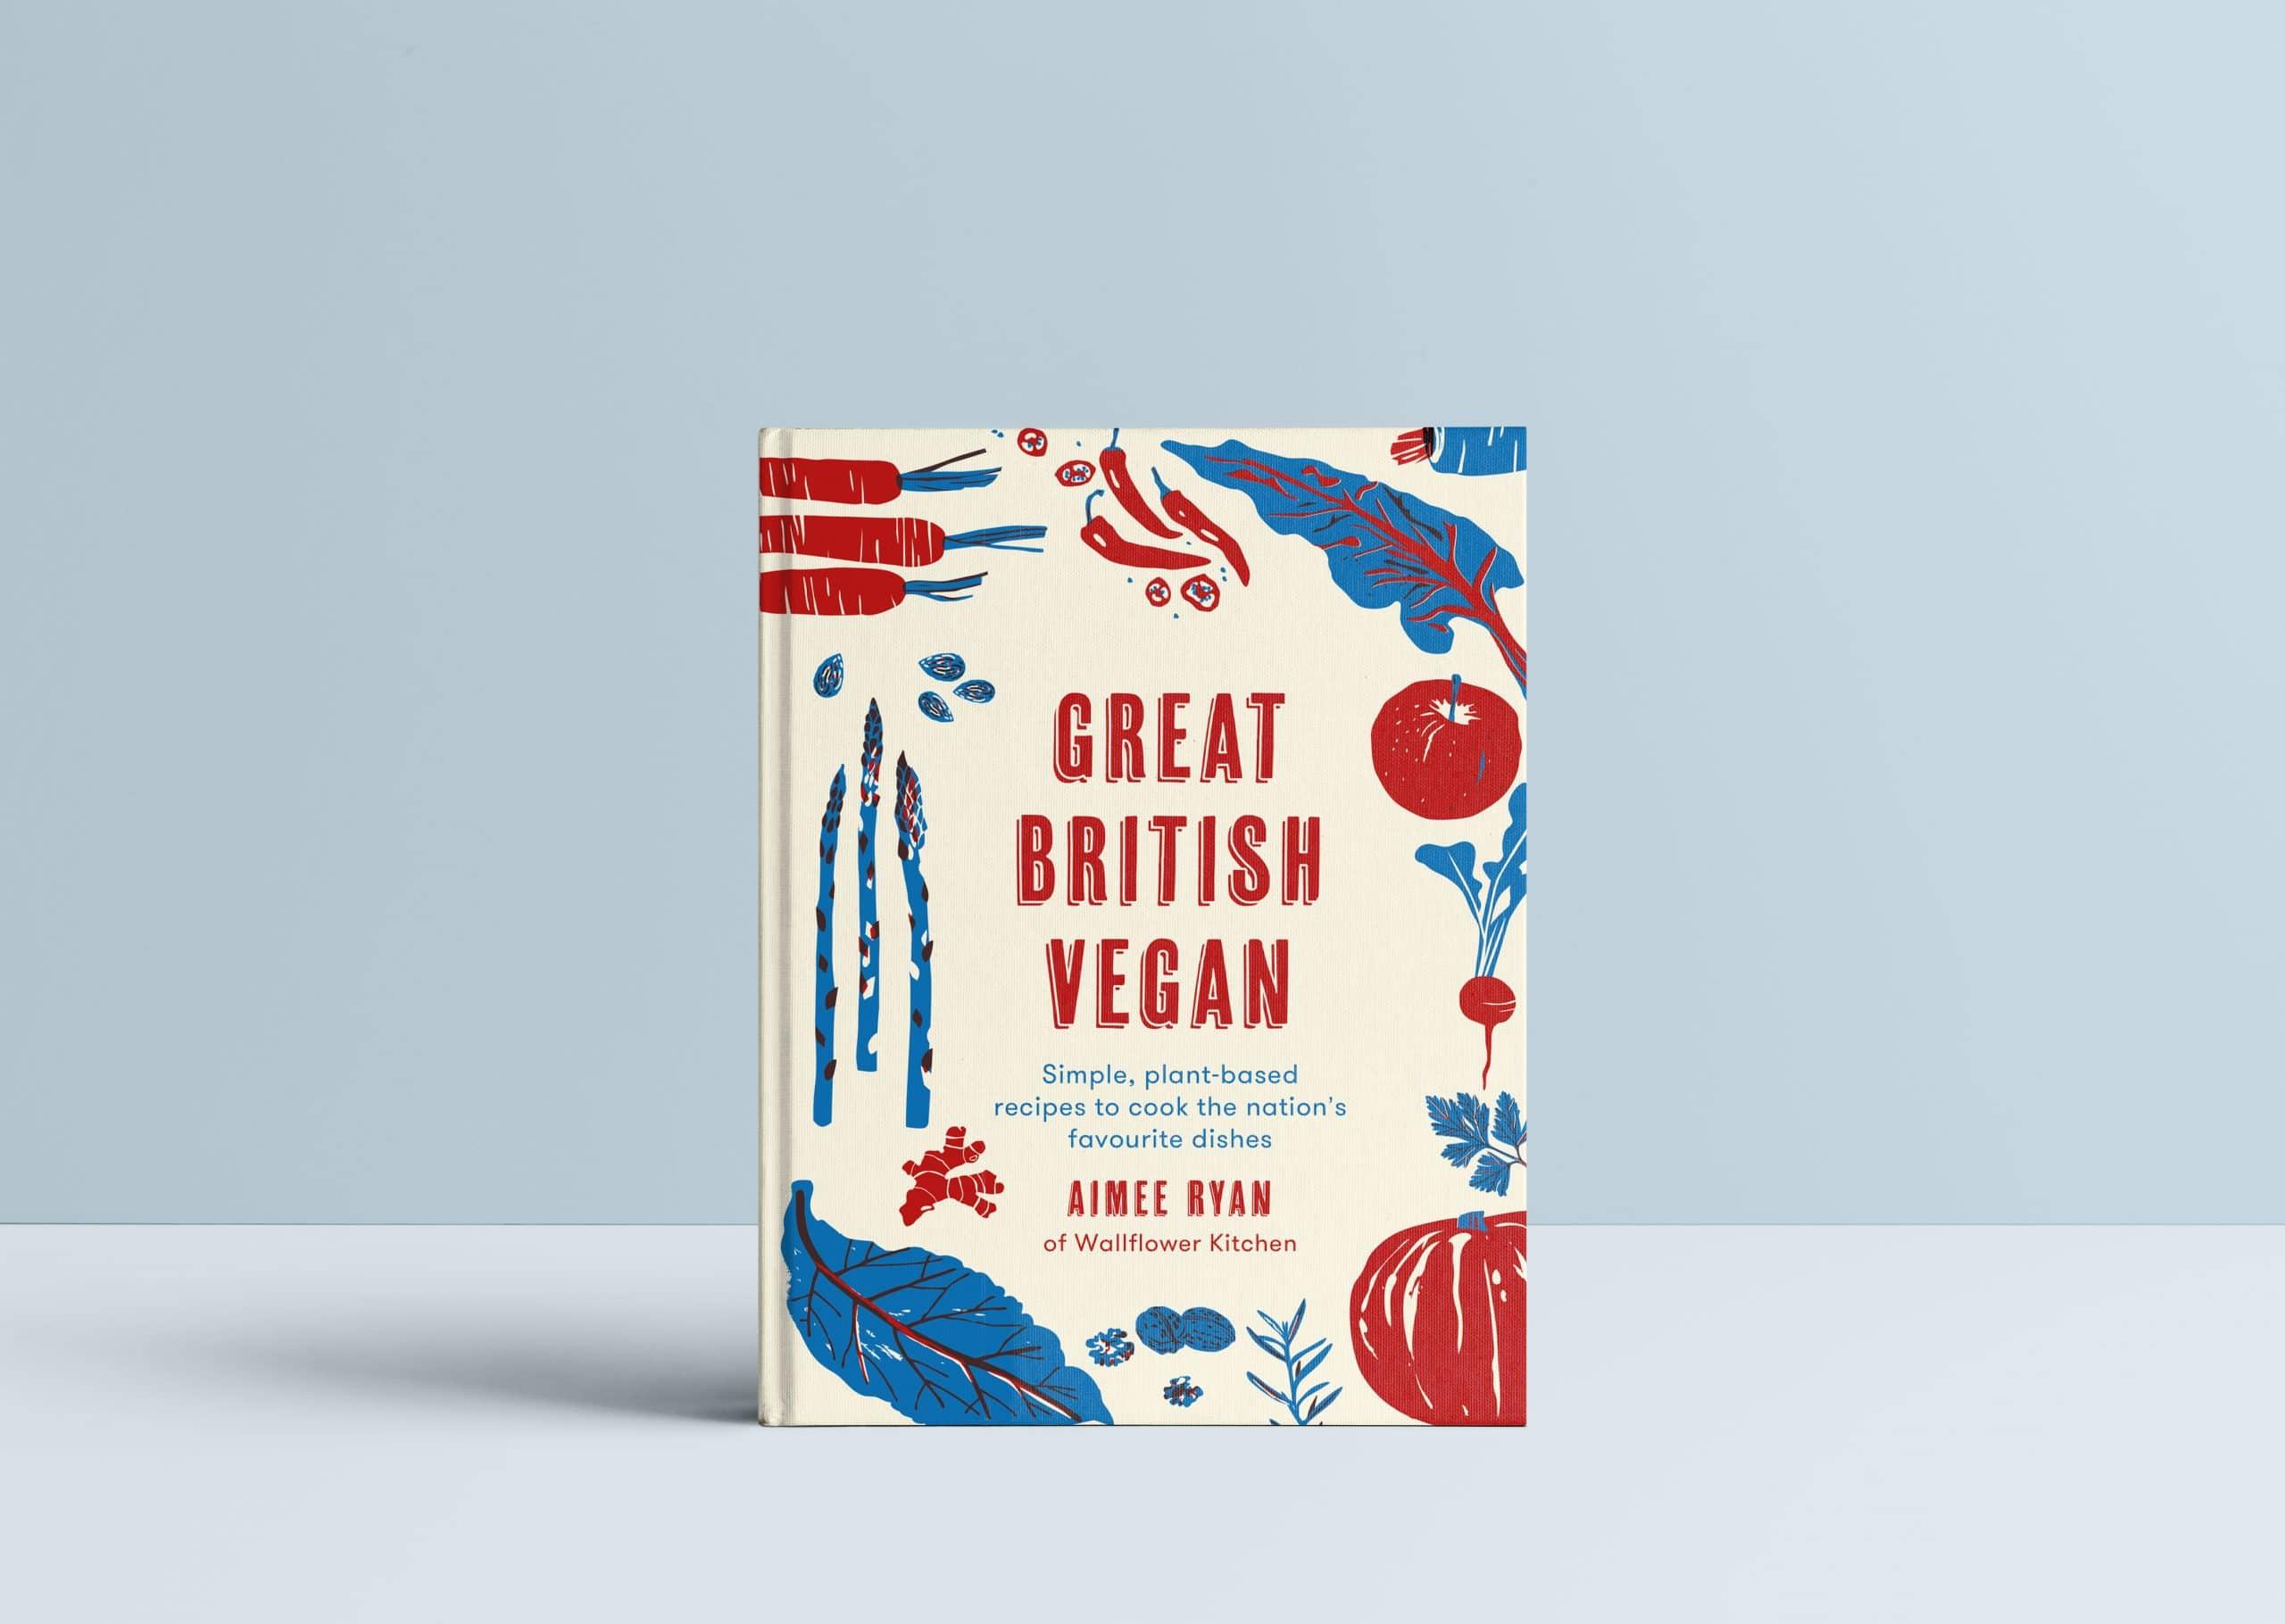 Great British Vegan Cookbook by Aimee Ryan